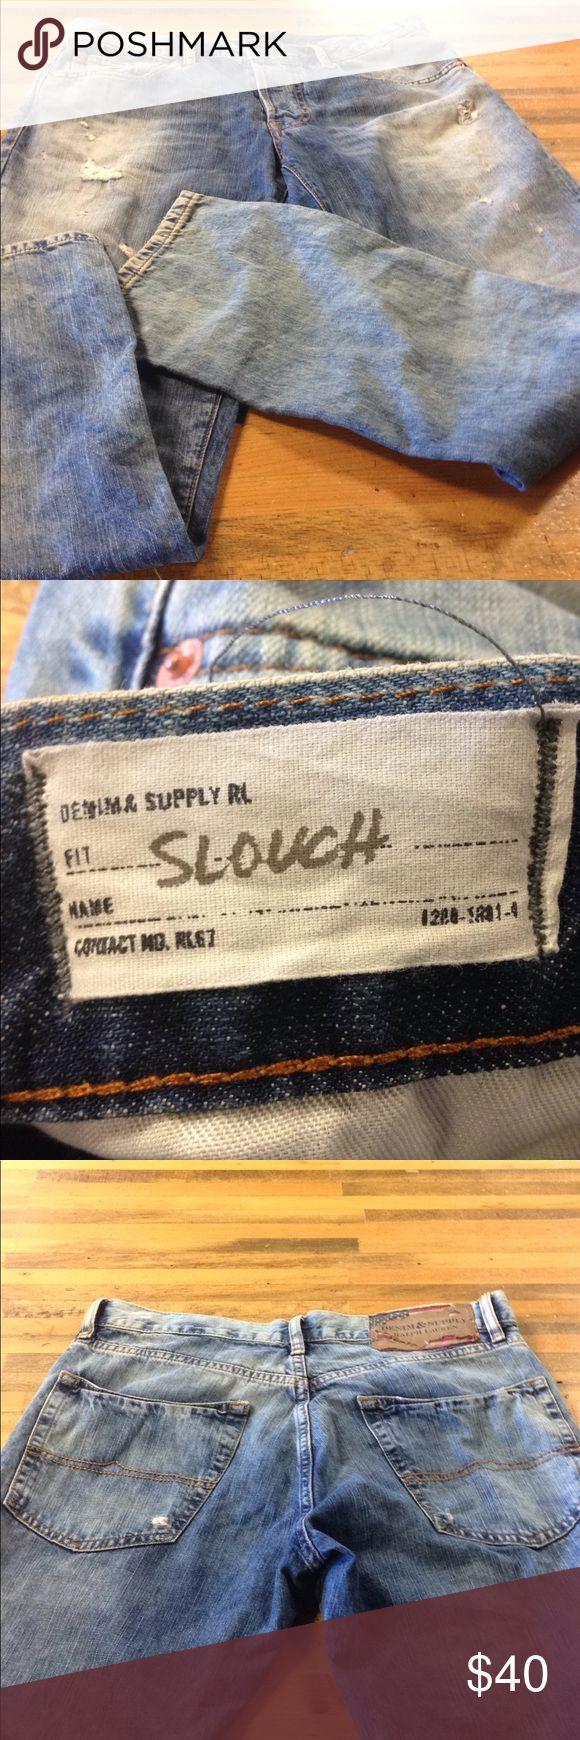 Men's Ralph Lauren Jeans Ralph Lauren worn slouch Jeans. Lightly used. Good condition. Denim & Supply Ralph Lauren Jeans Straight